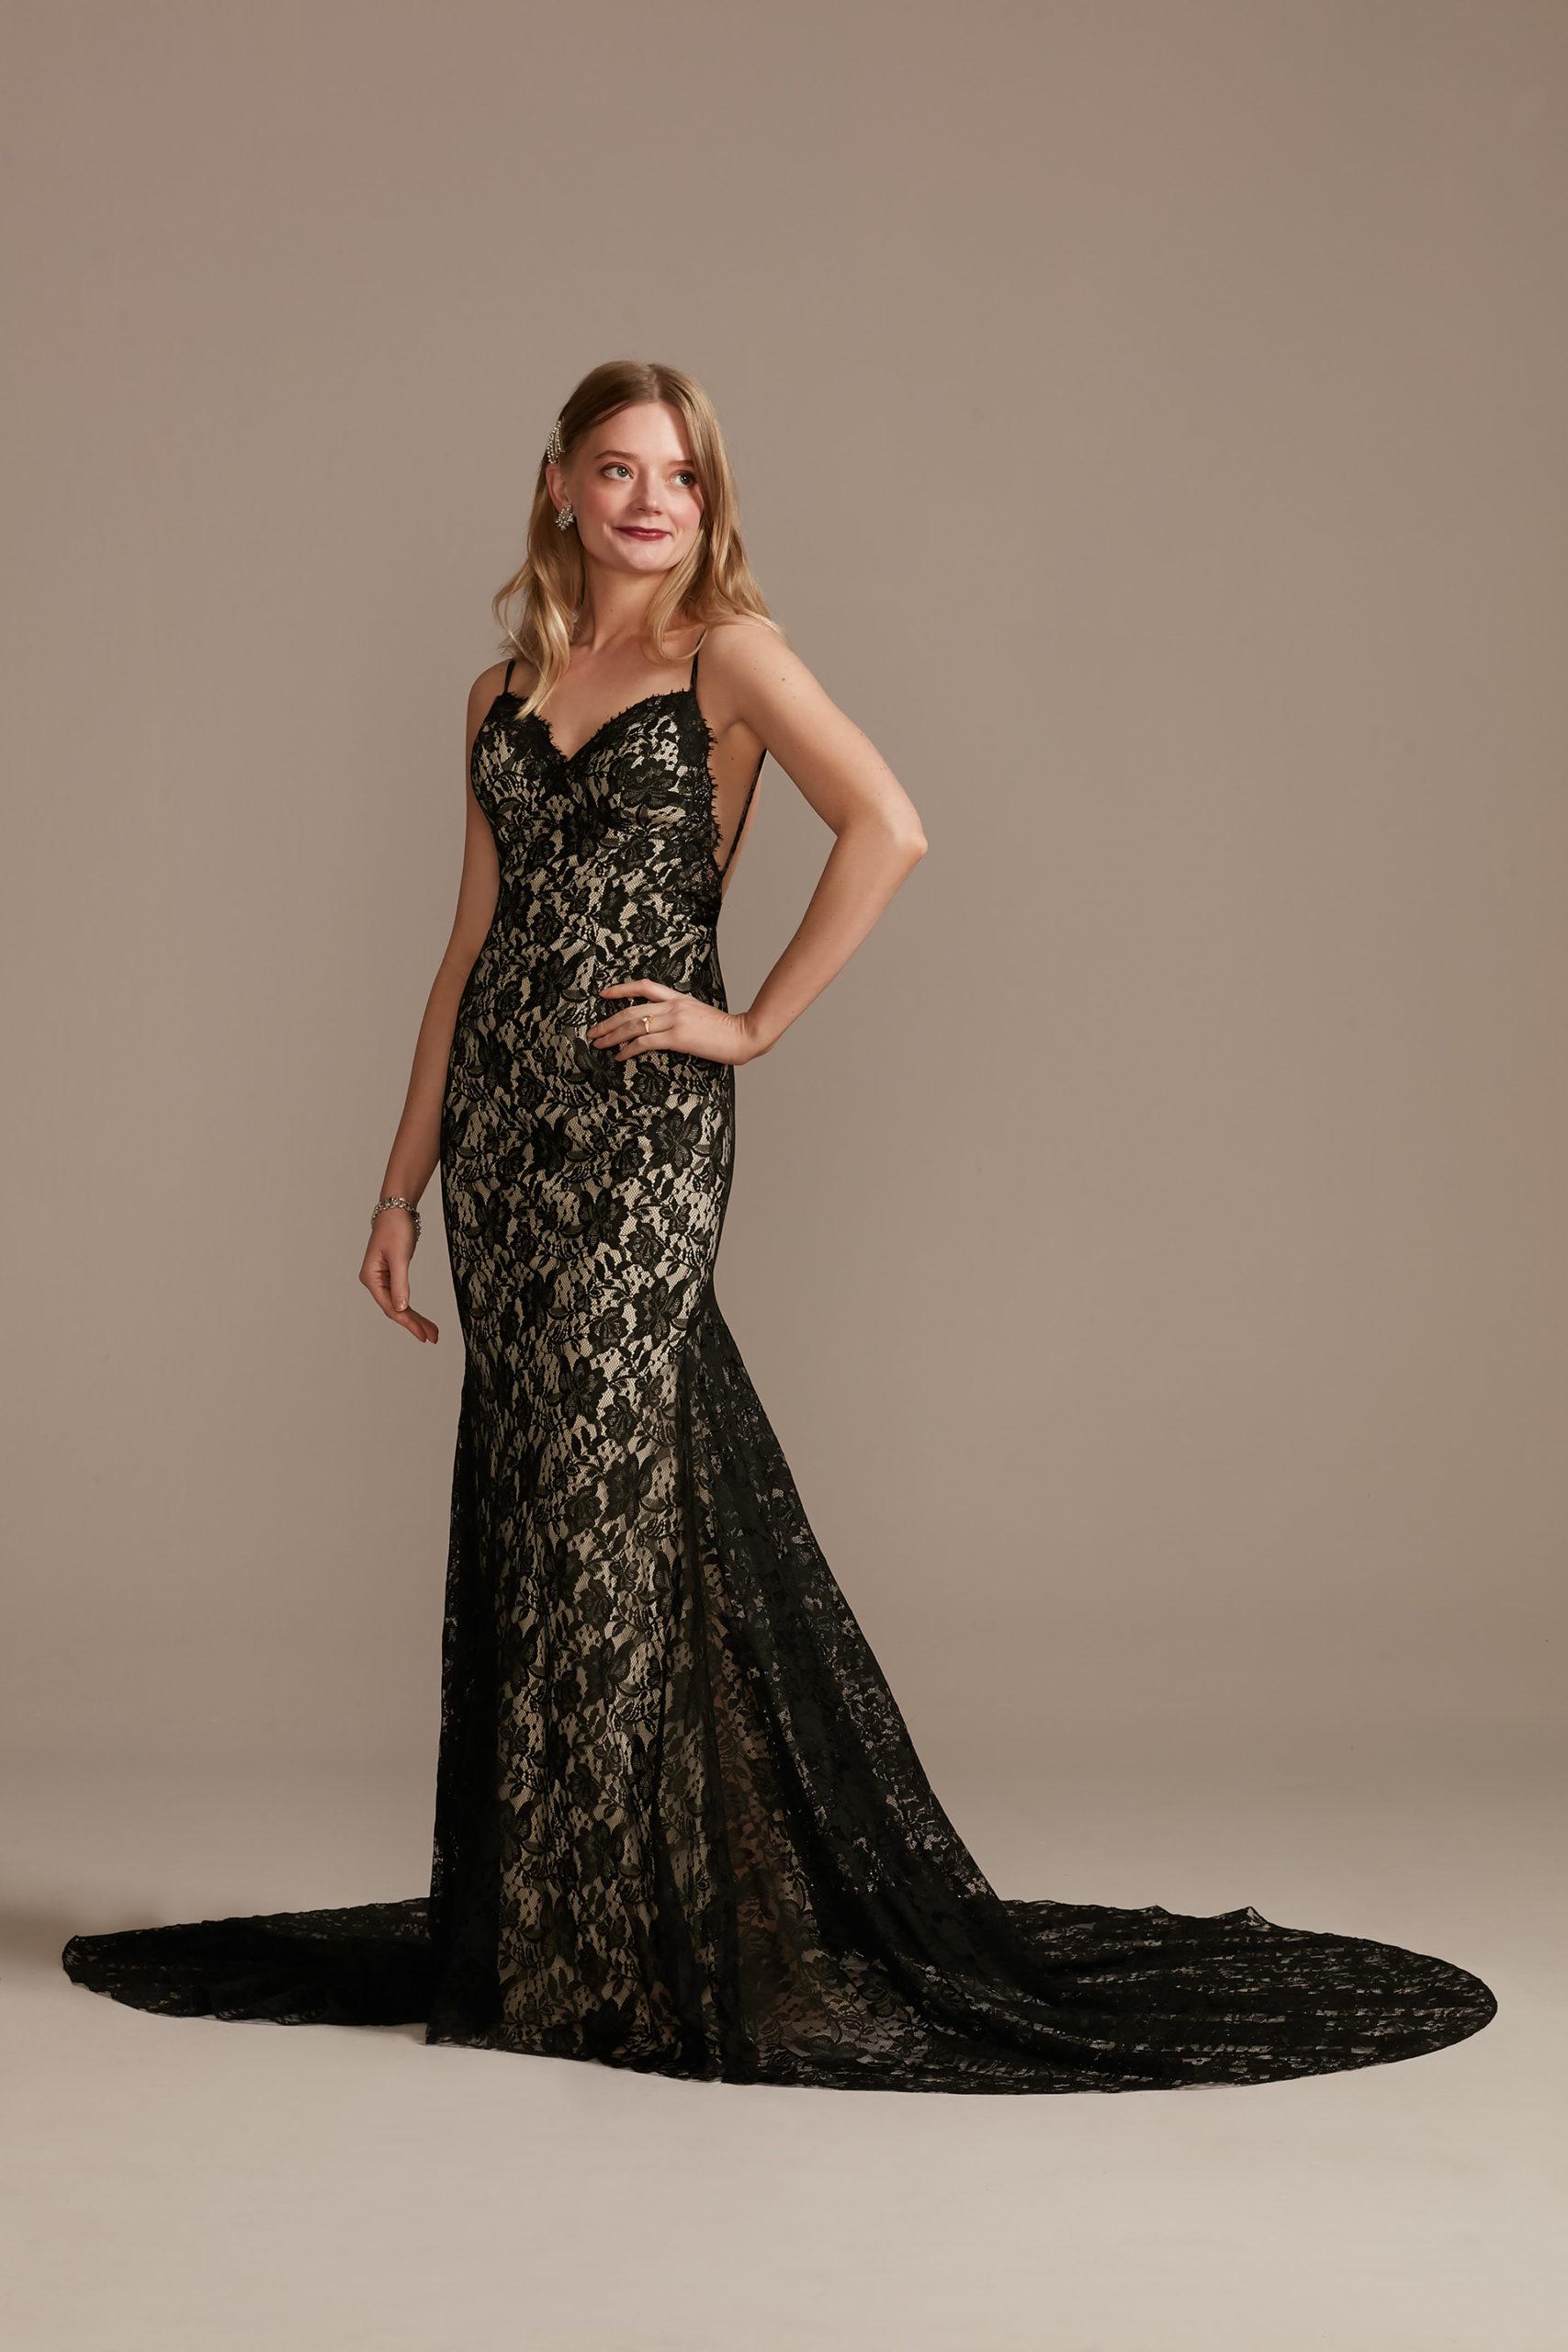 unconventional black lace wedding dress